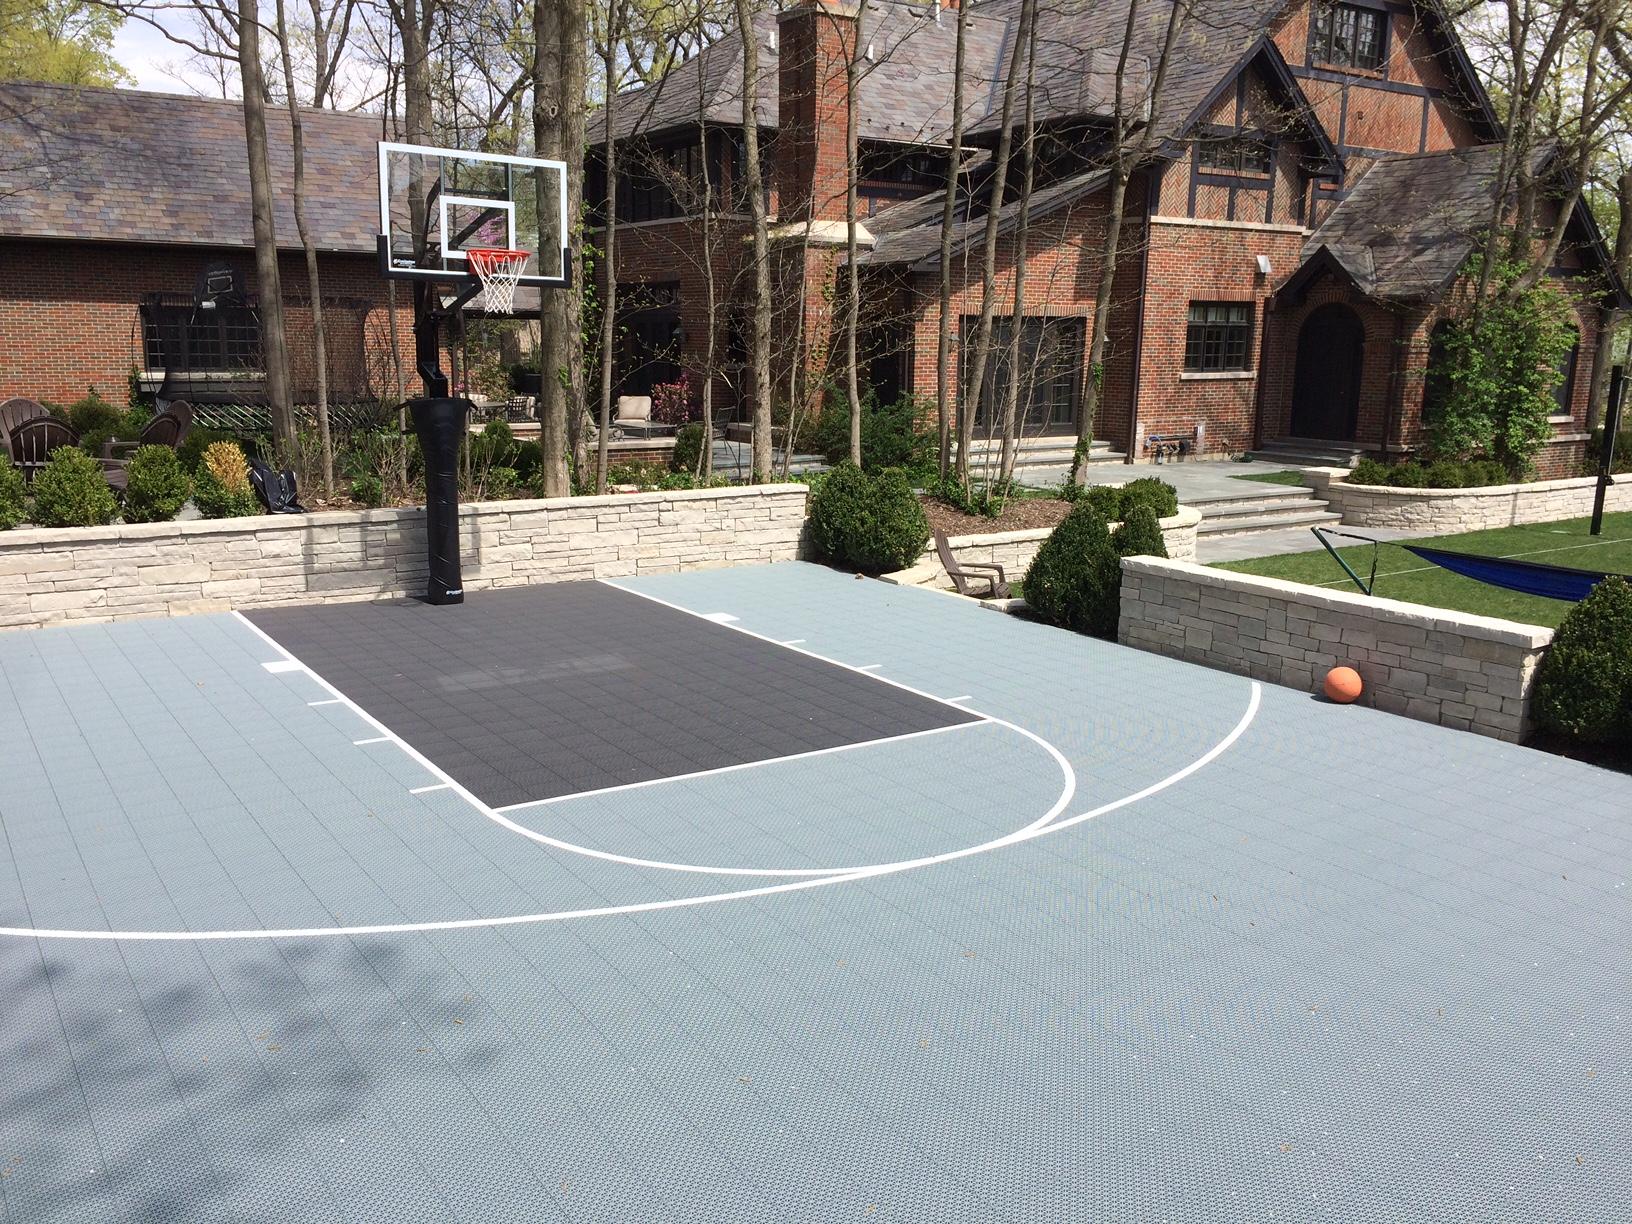 chicago il basketball court installation supreme sports